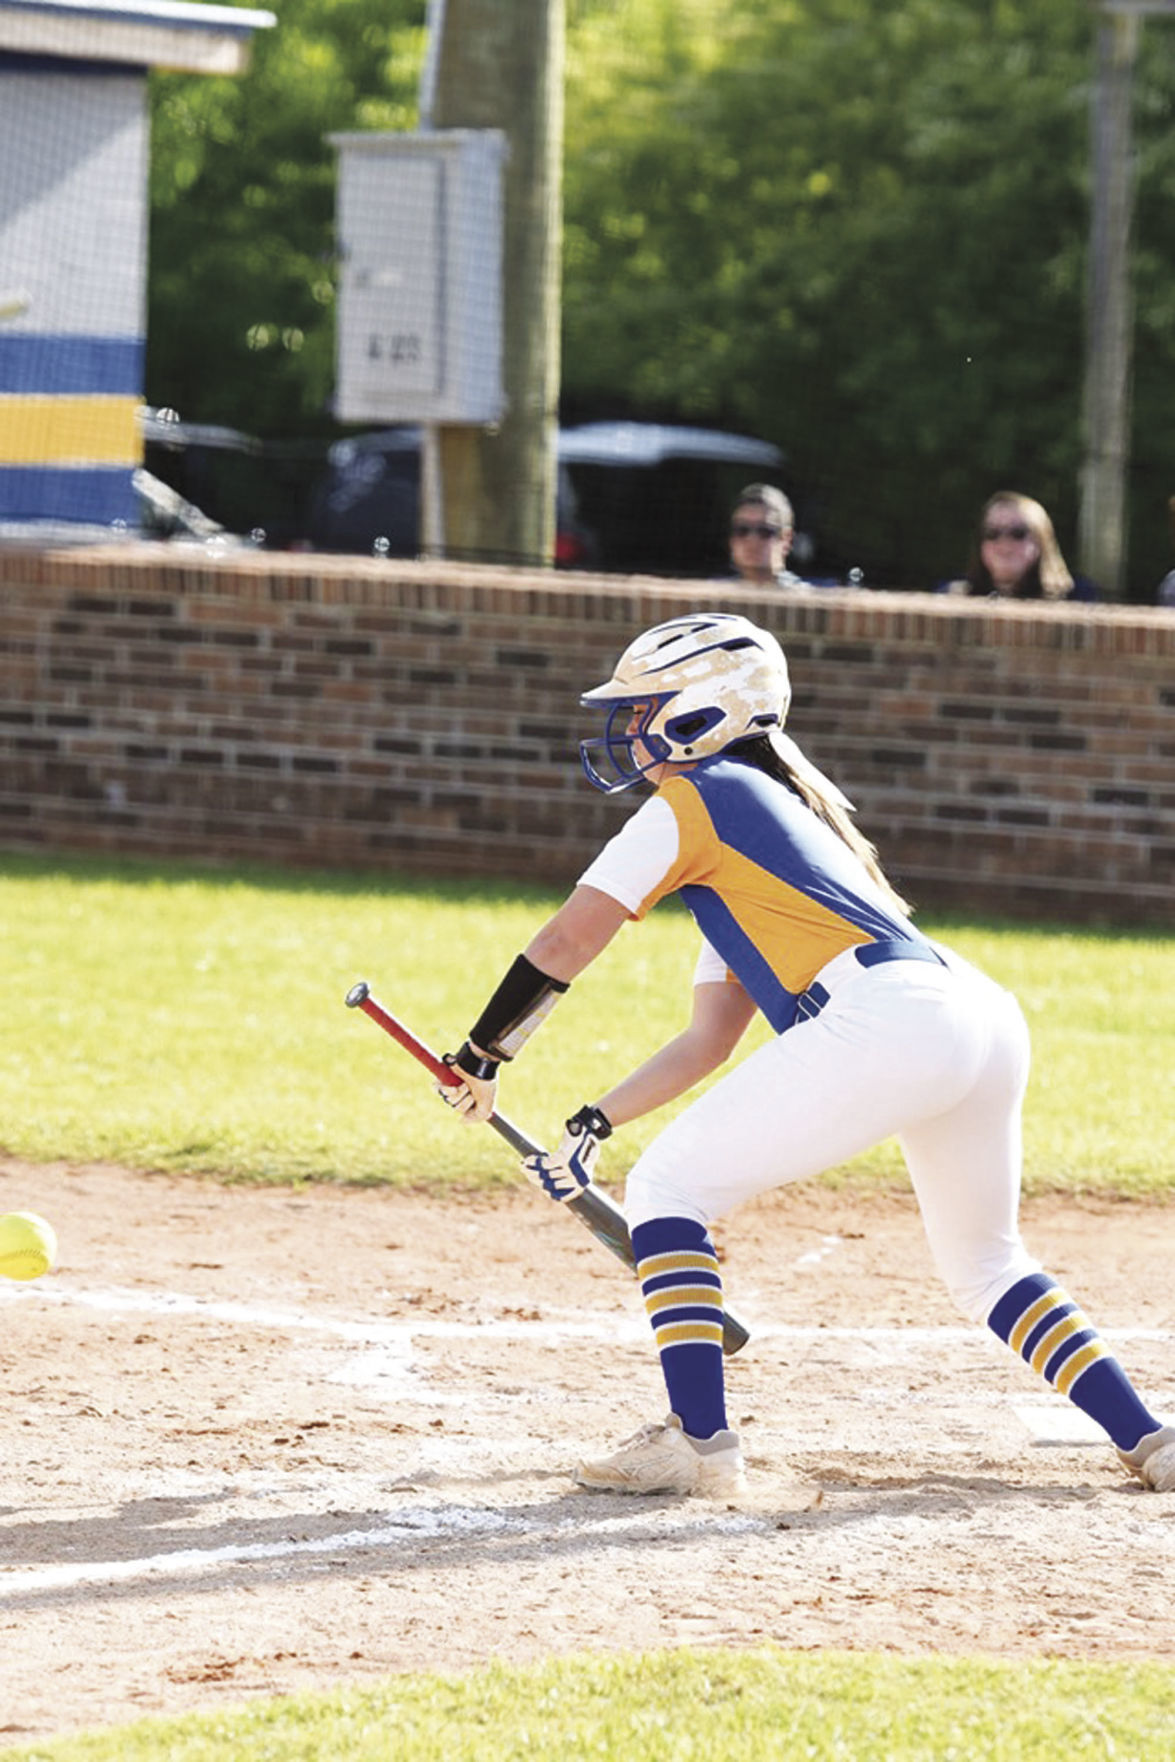 Sequoyah softball vs. Sweetwater-2